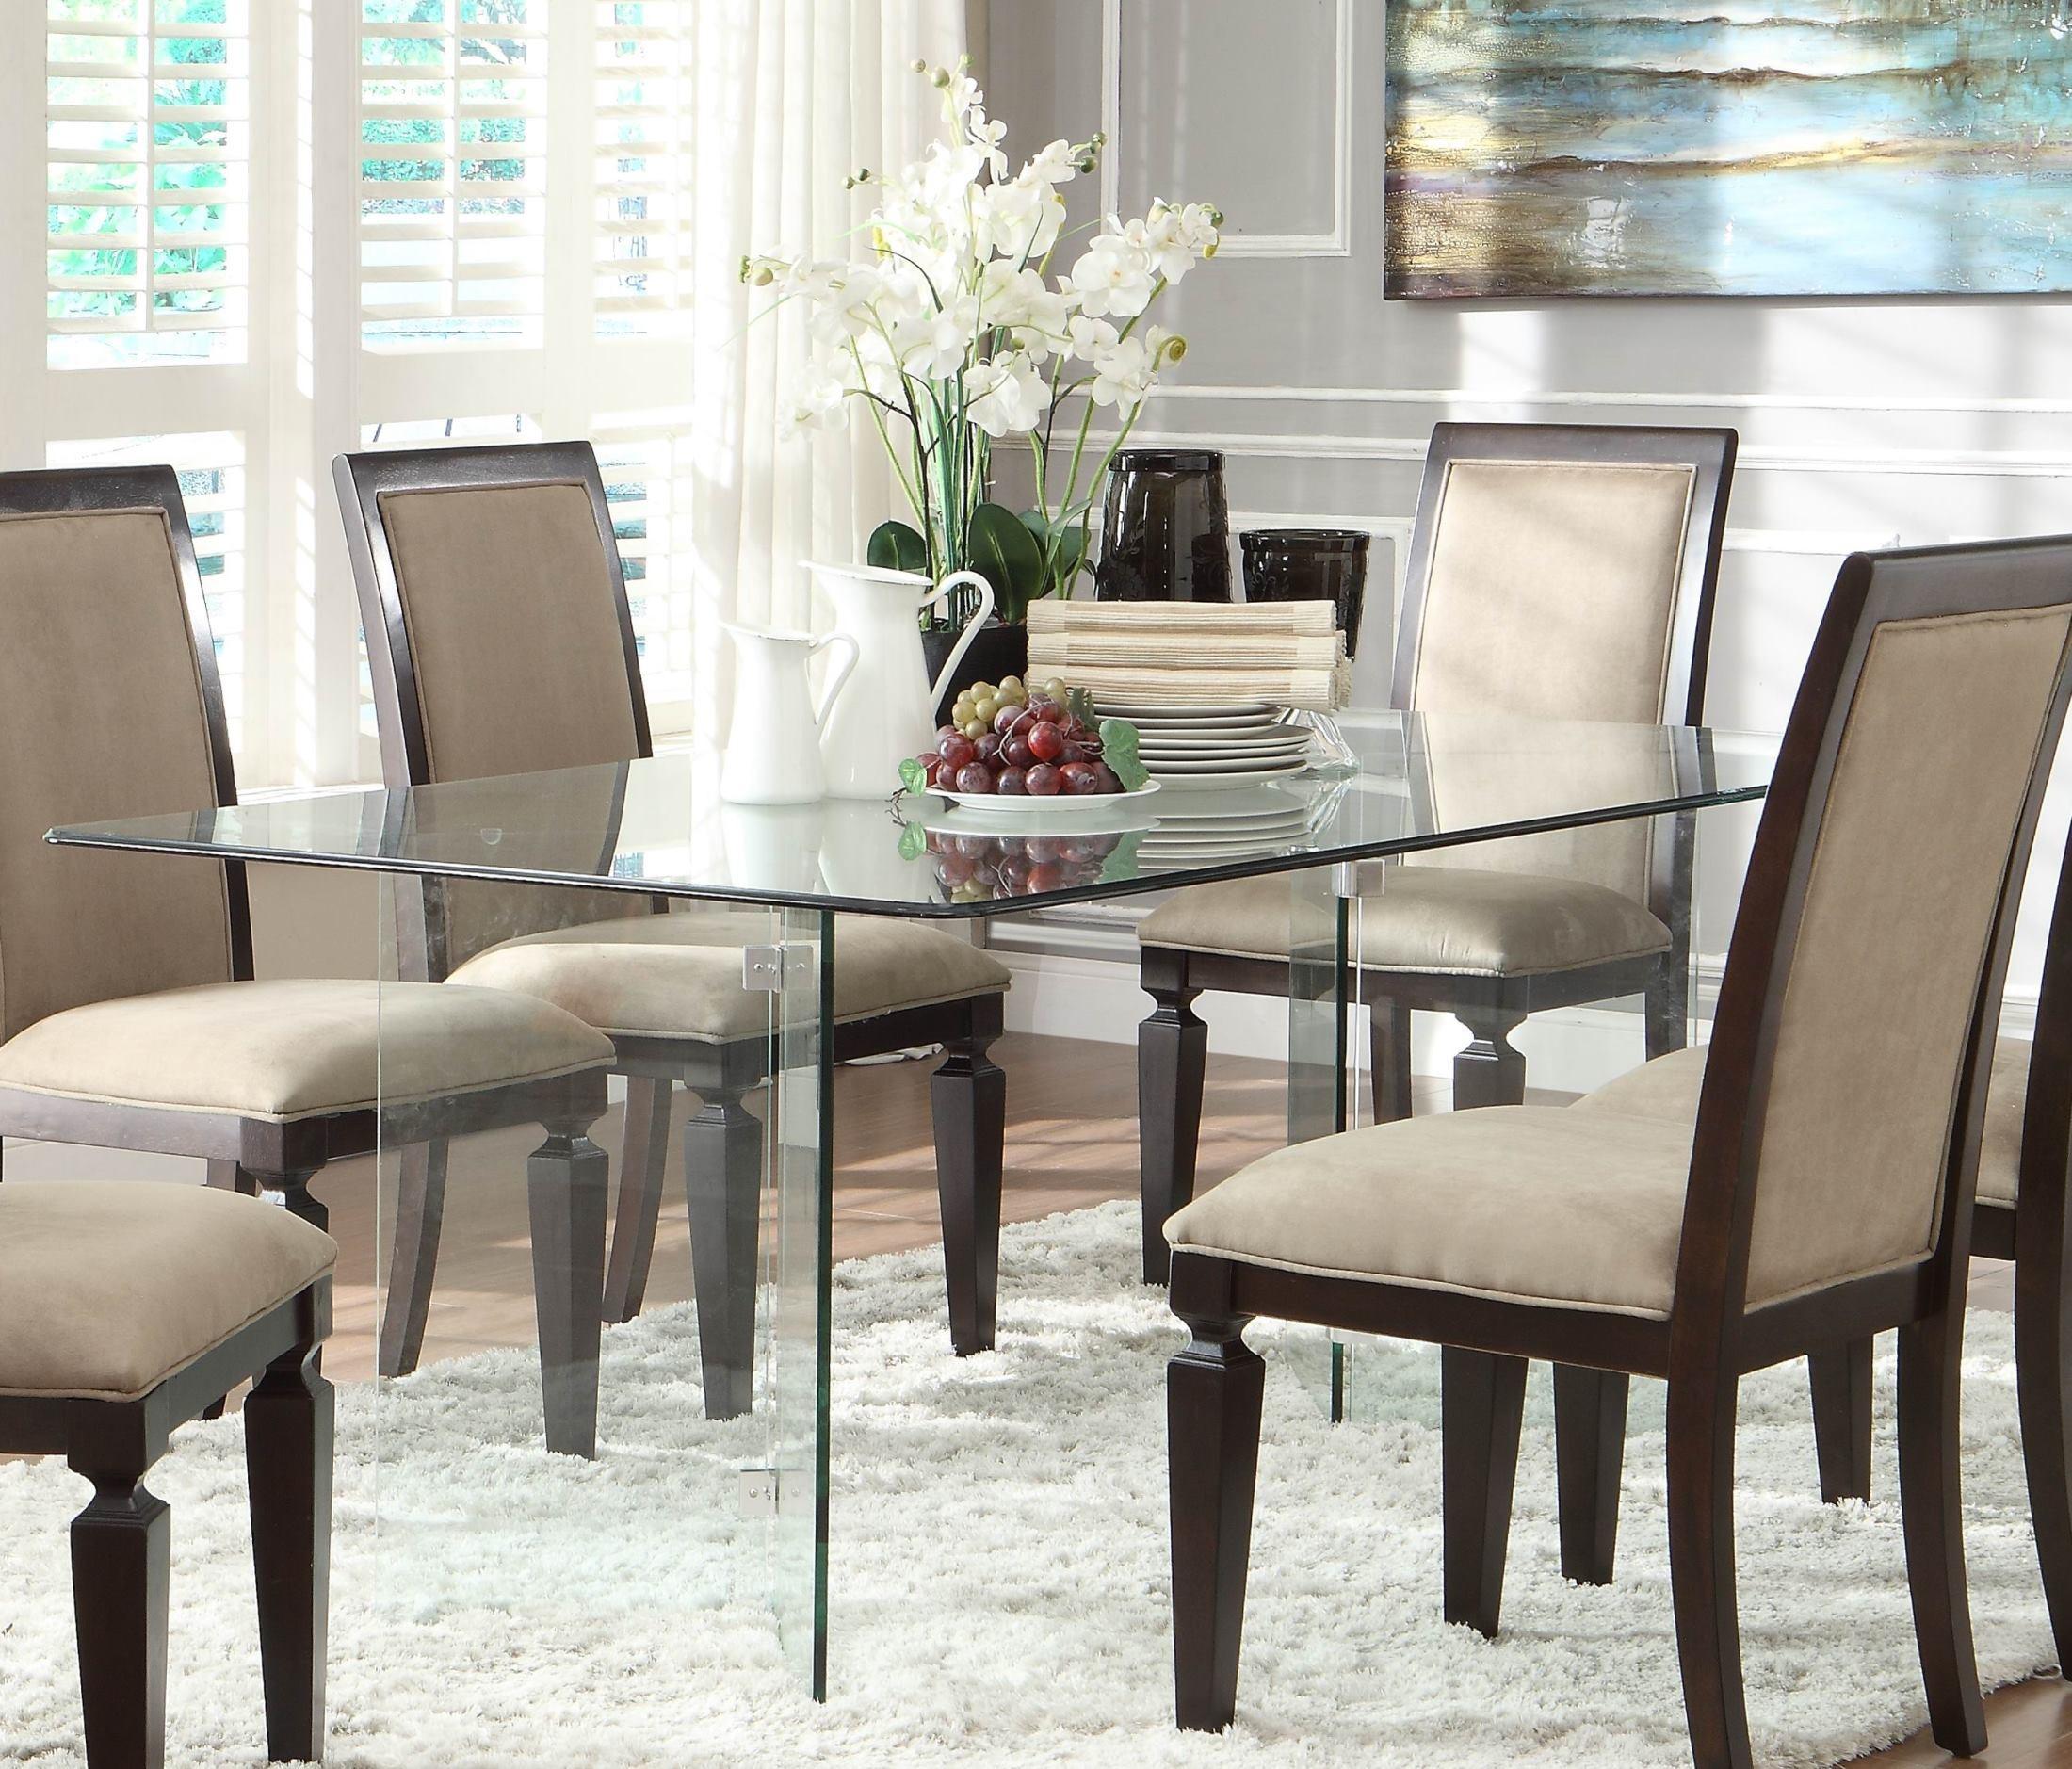 Alouette Rectangular Glass Dining Table From Homelegance